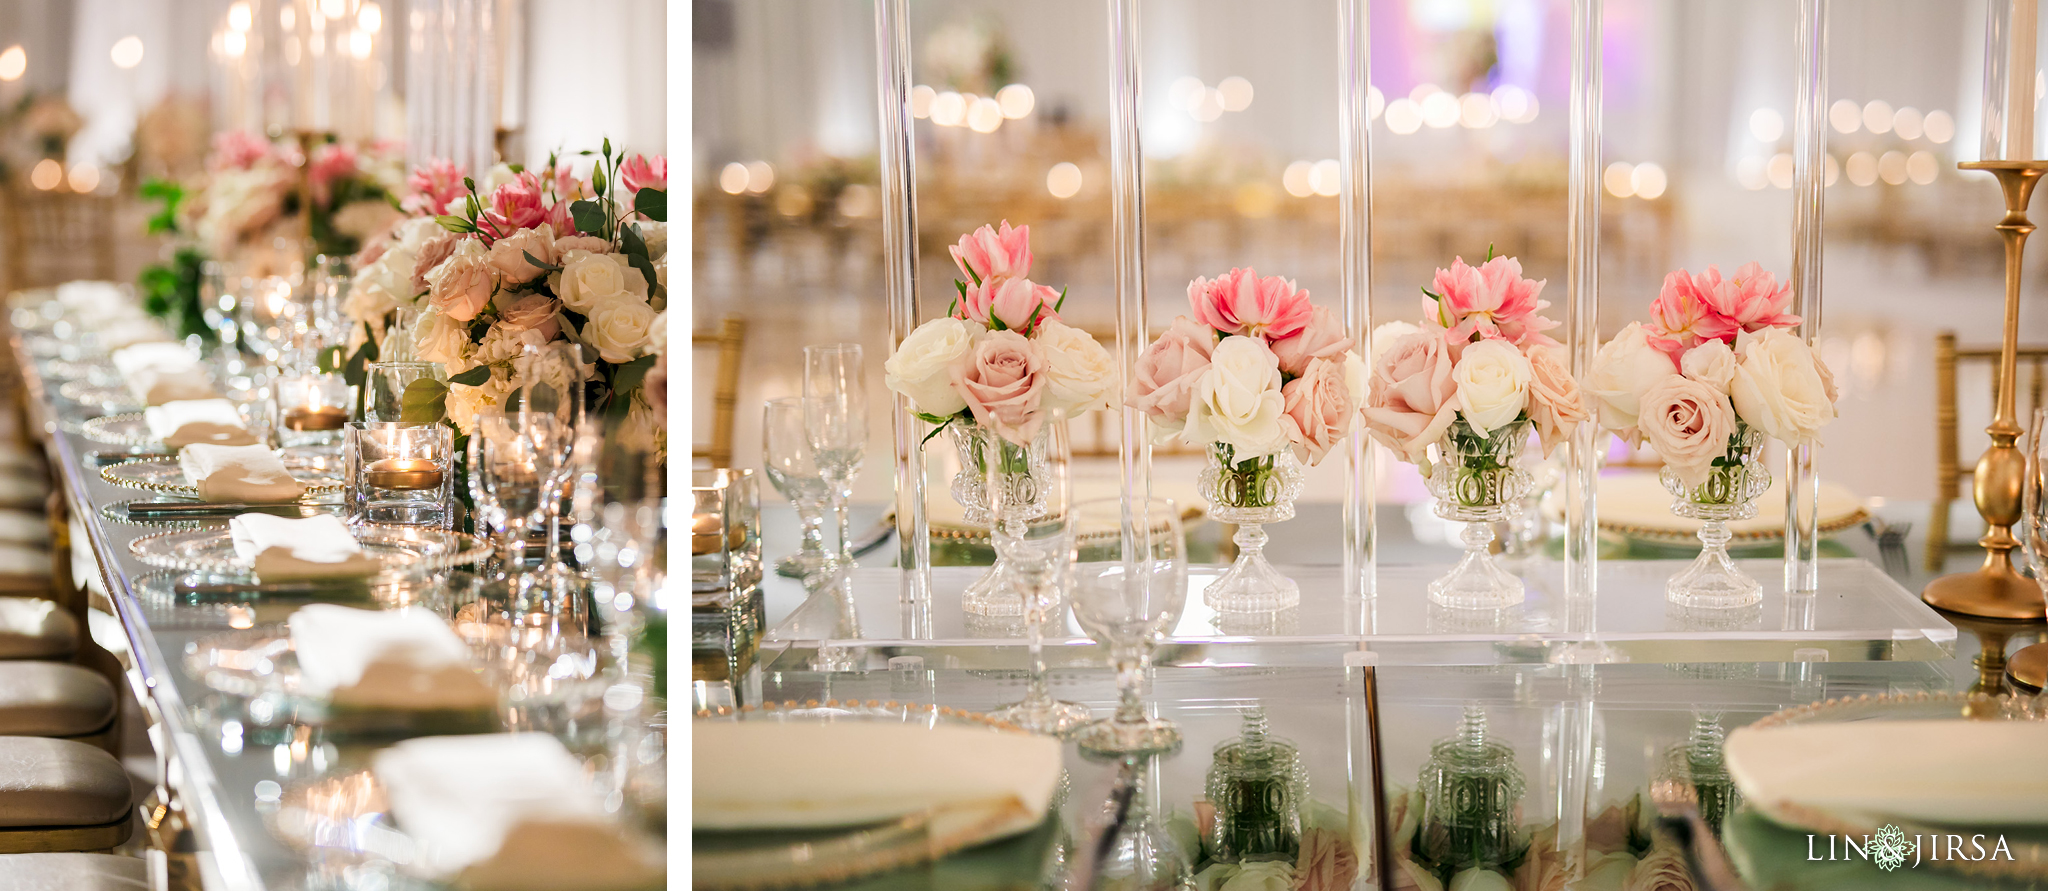 07 Hilton Santa Barbara Beachfront Resort Indian Wedding Reception Photography